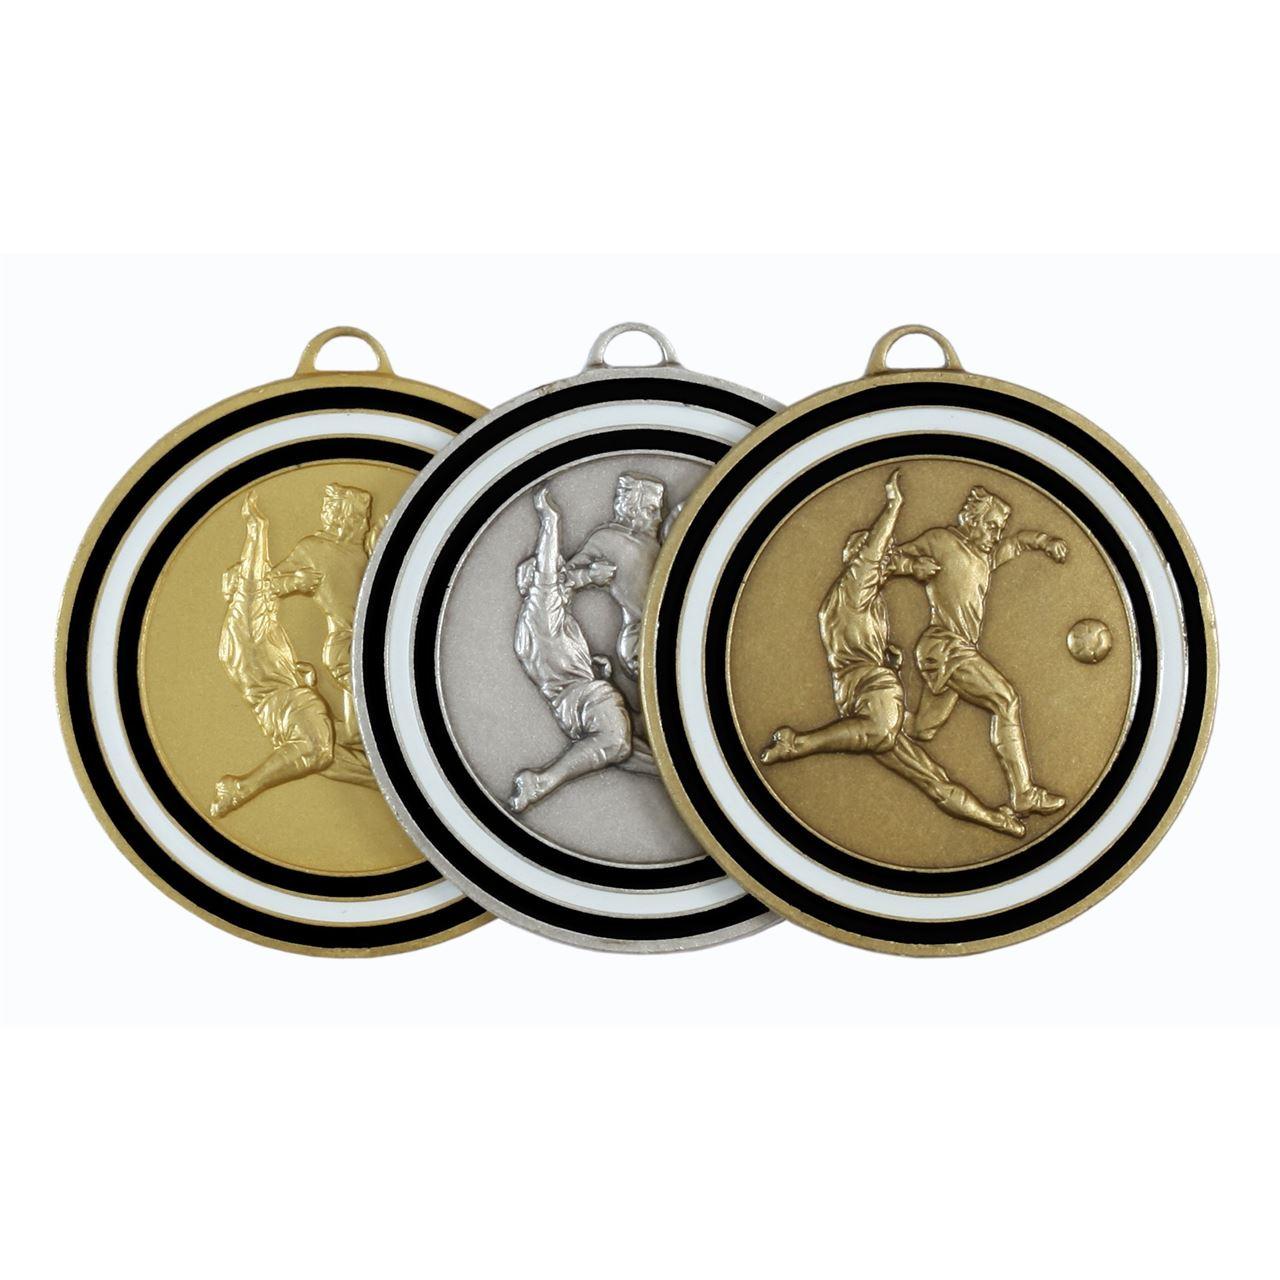 Black Coloured Enamel Football Medal (size: 50mm) - 175